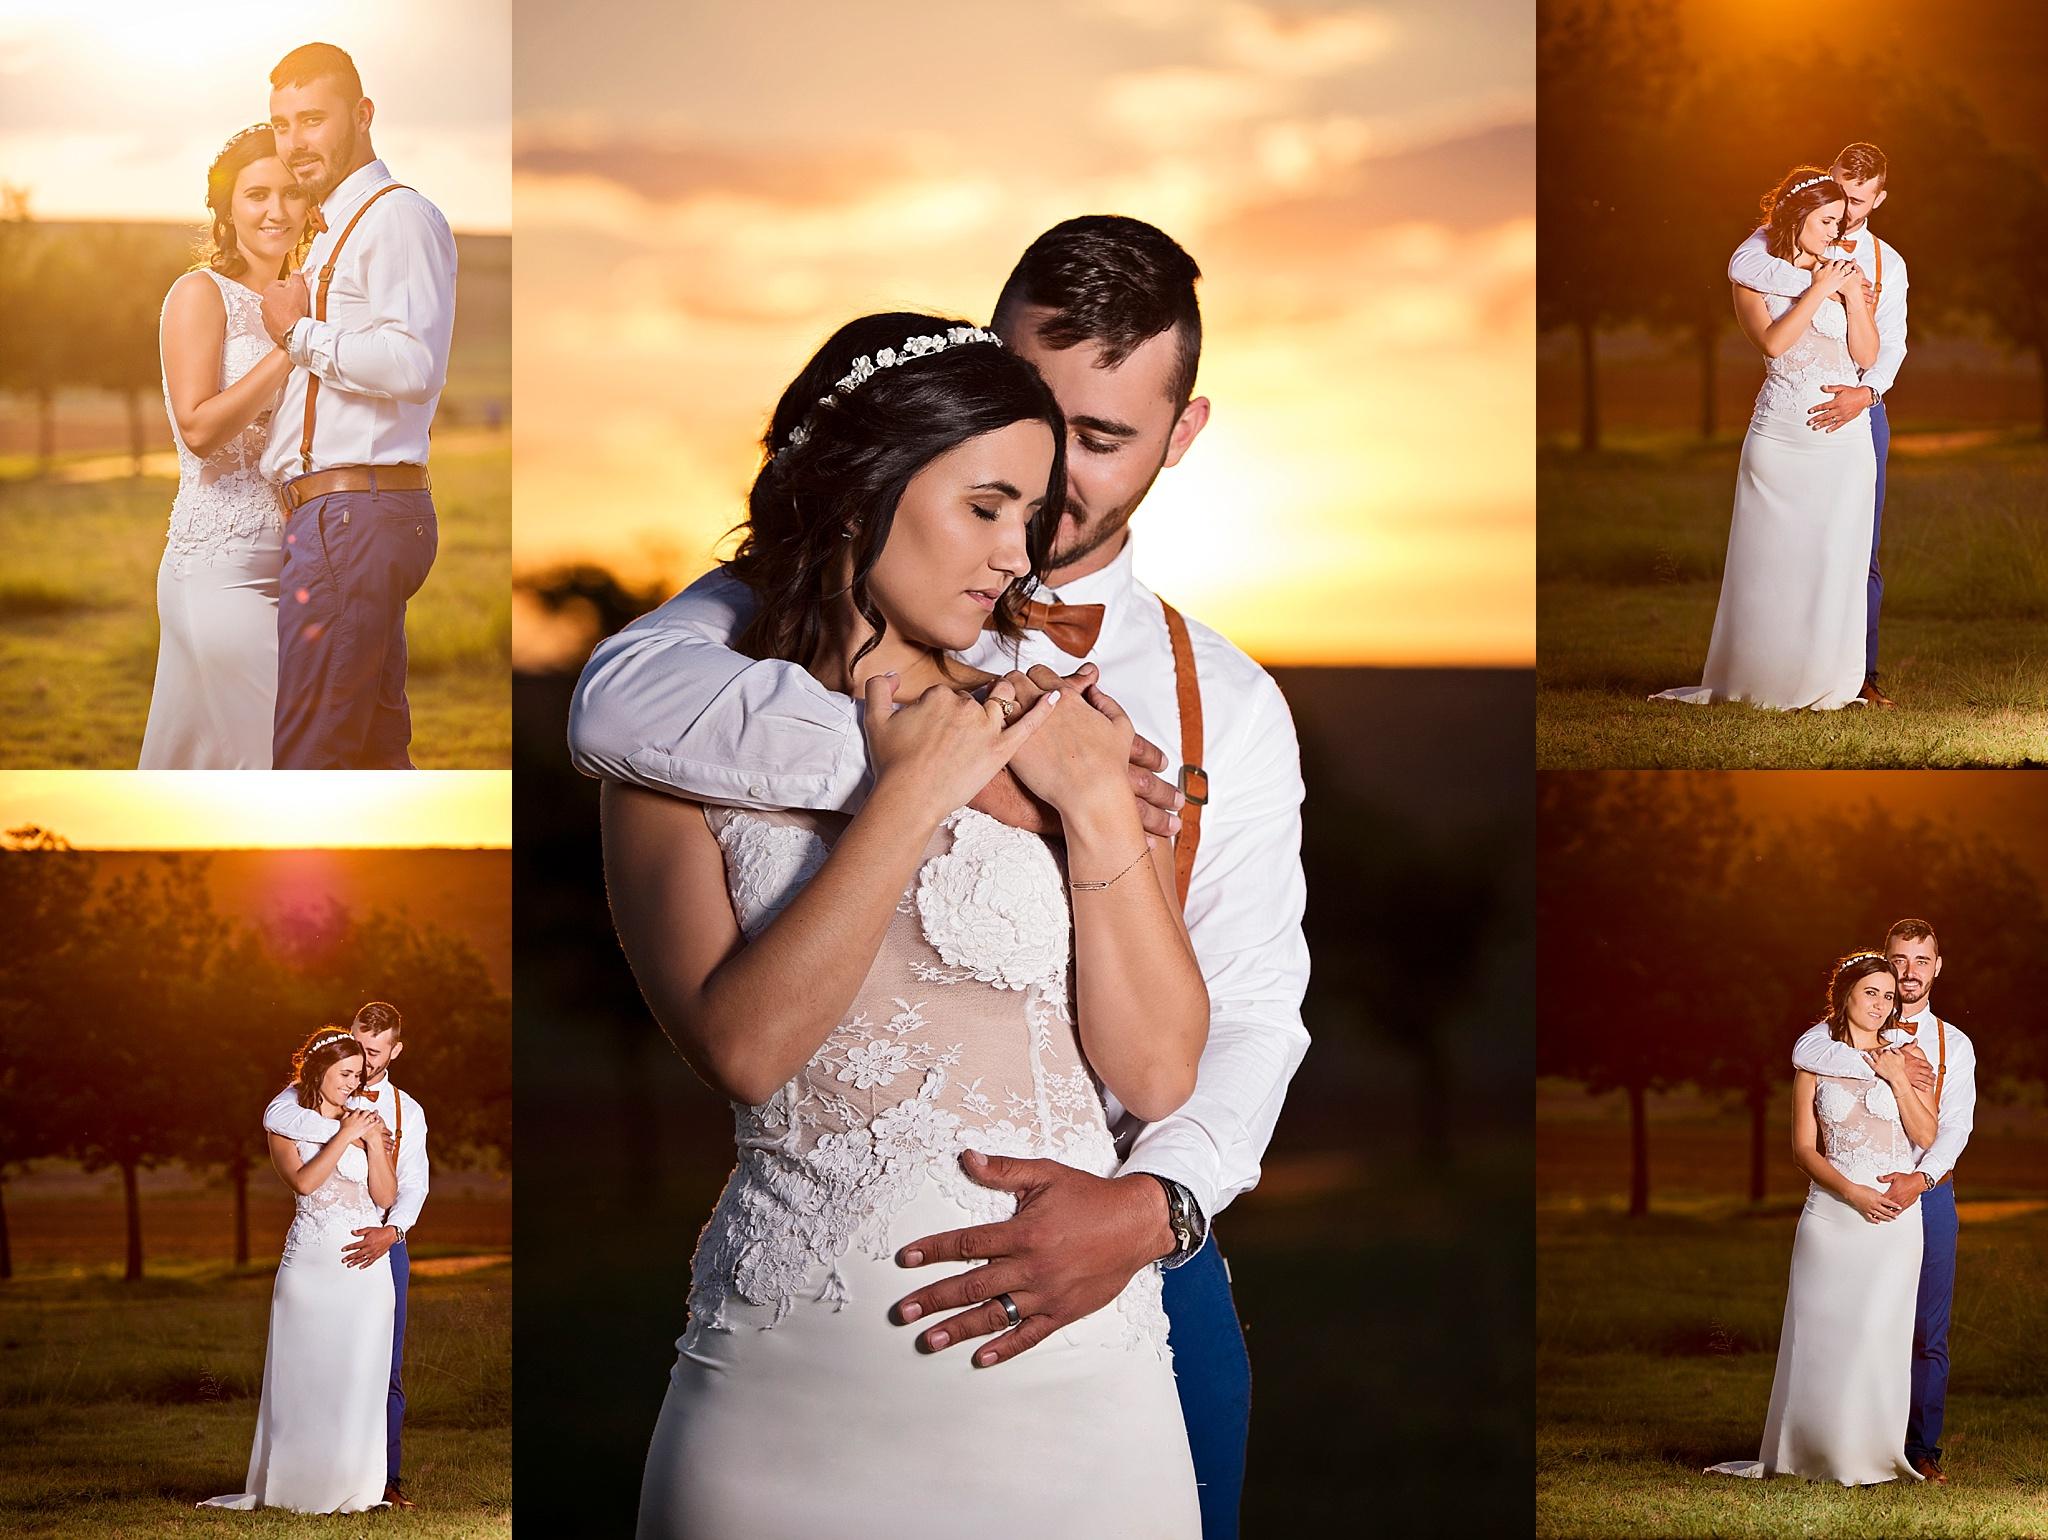 creative-sunset-wedding-photoshoot.jpg